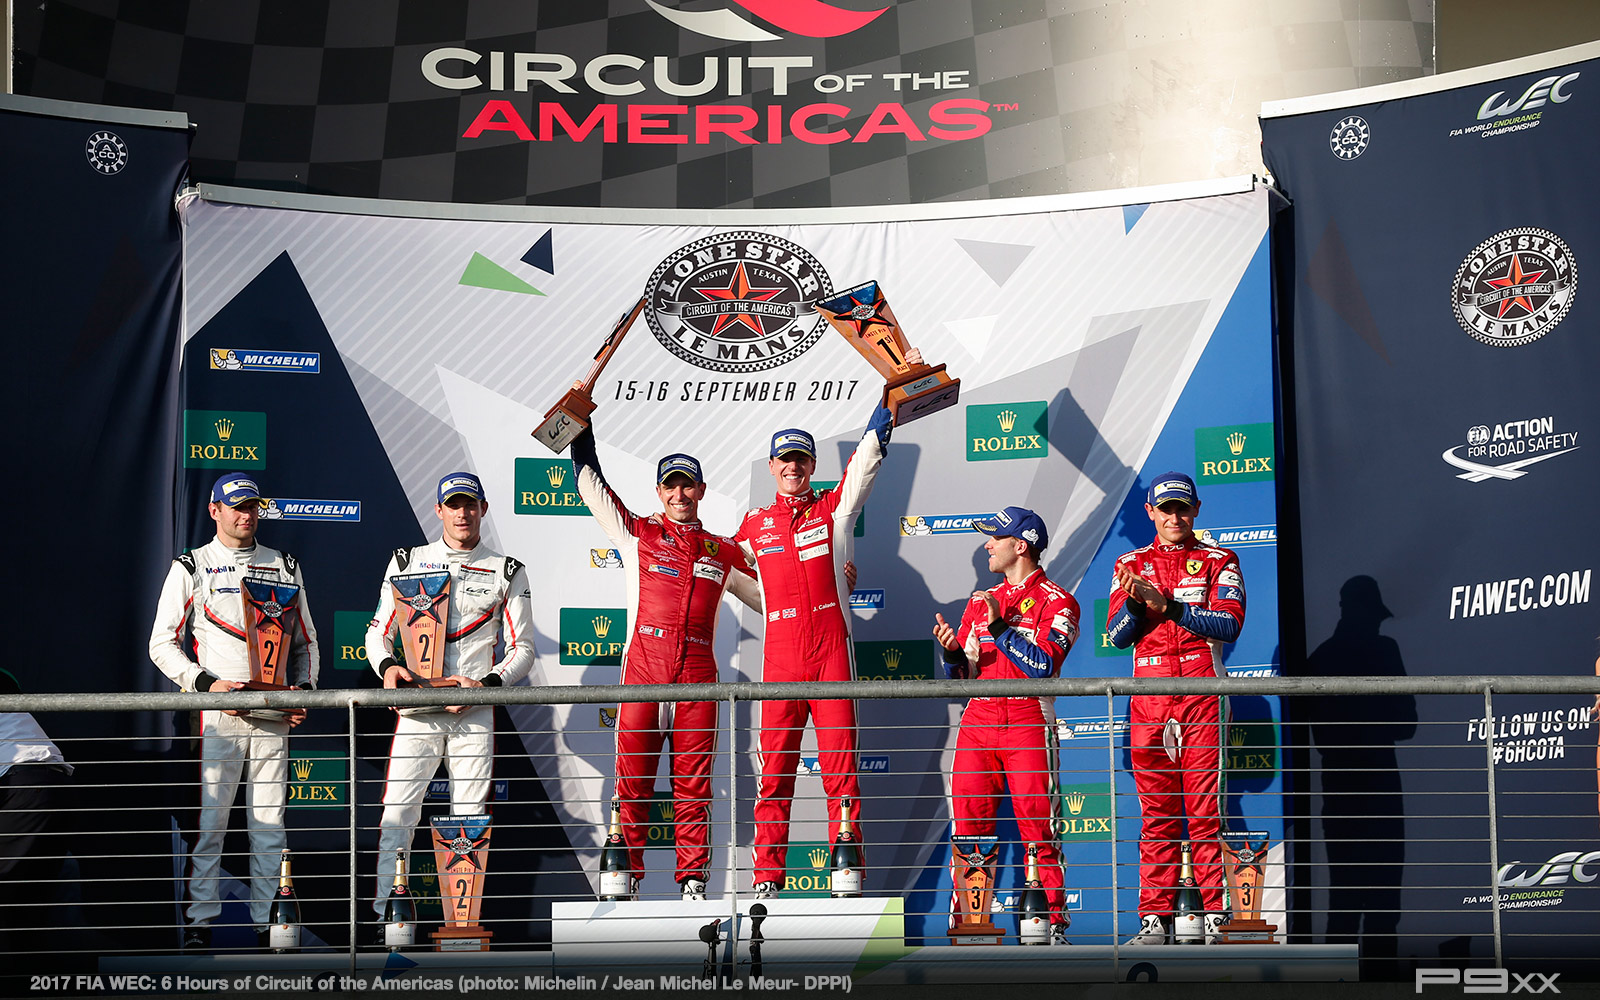 2017-FIA-WEC-6-HOURS-OF-COTA-PORSCHE-stin_02117009_103849_315